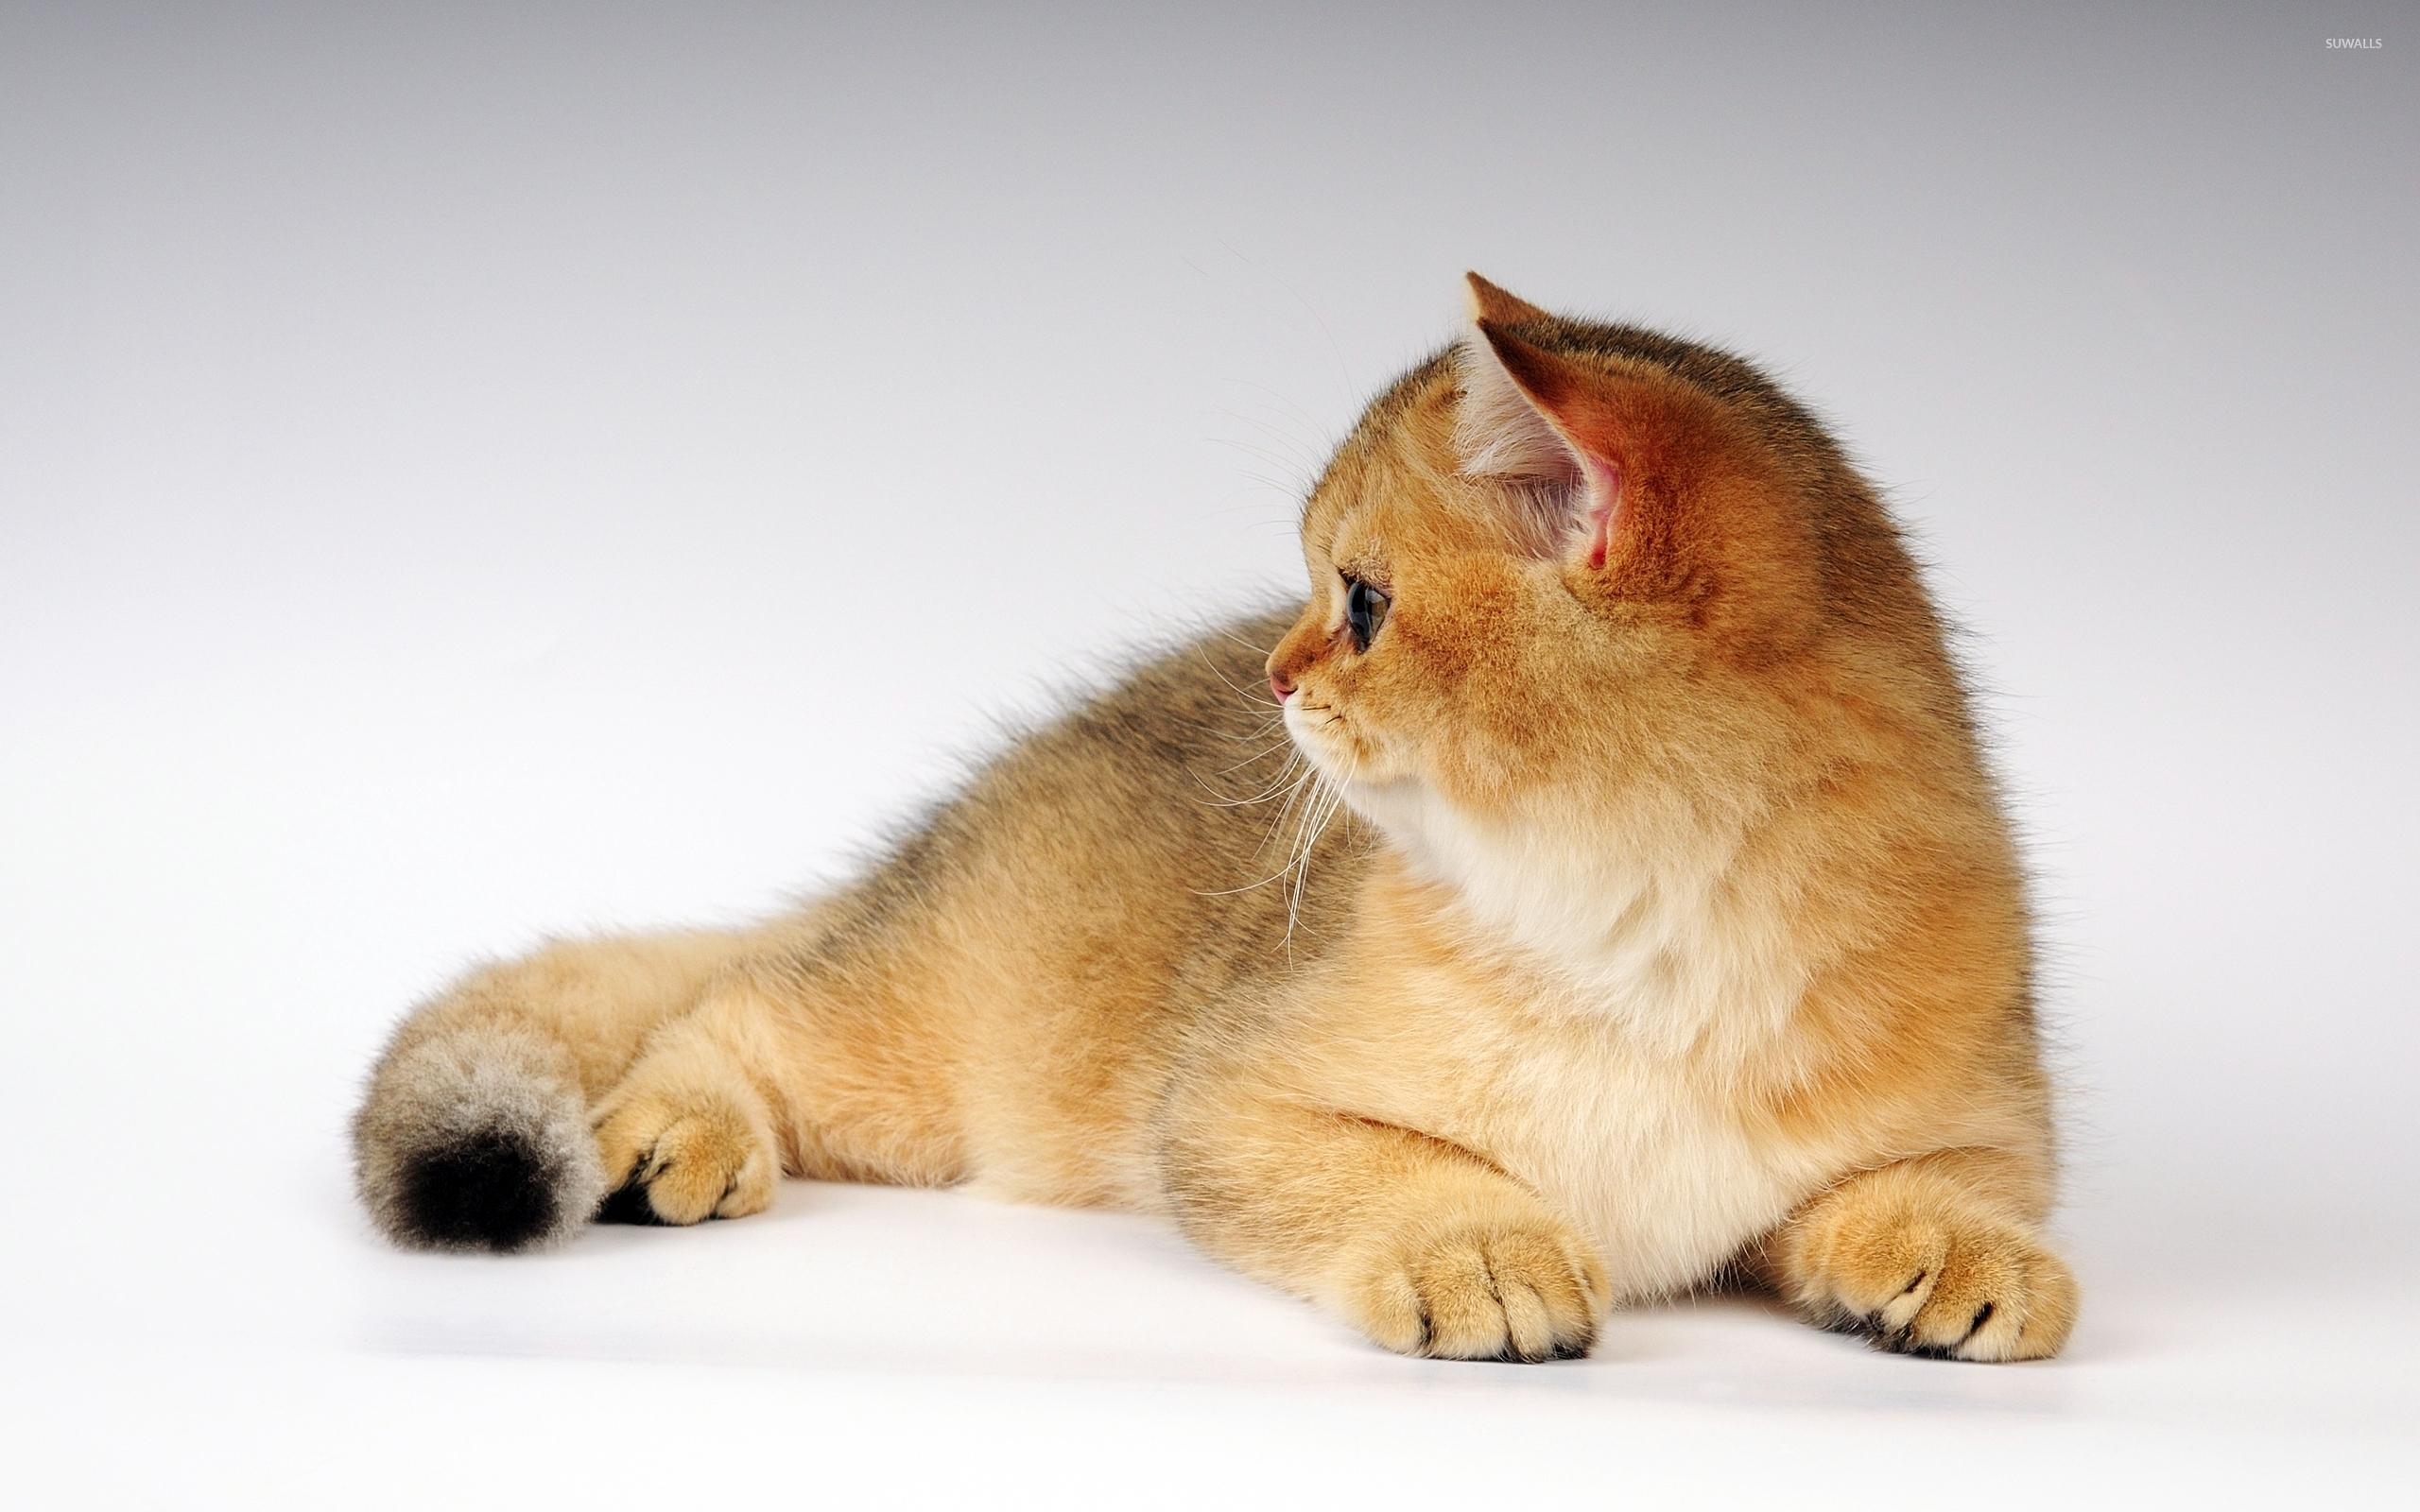 Ginger Cat Laying Wallpaper Animal Wallpapers 34055